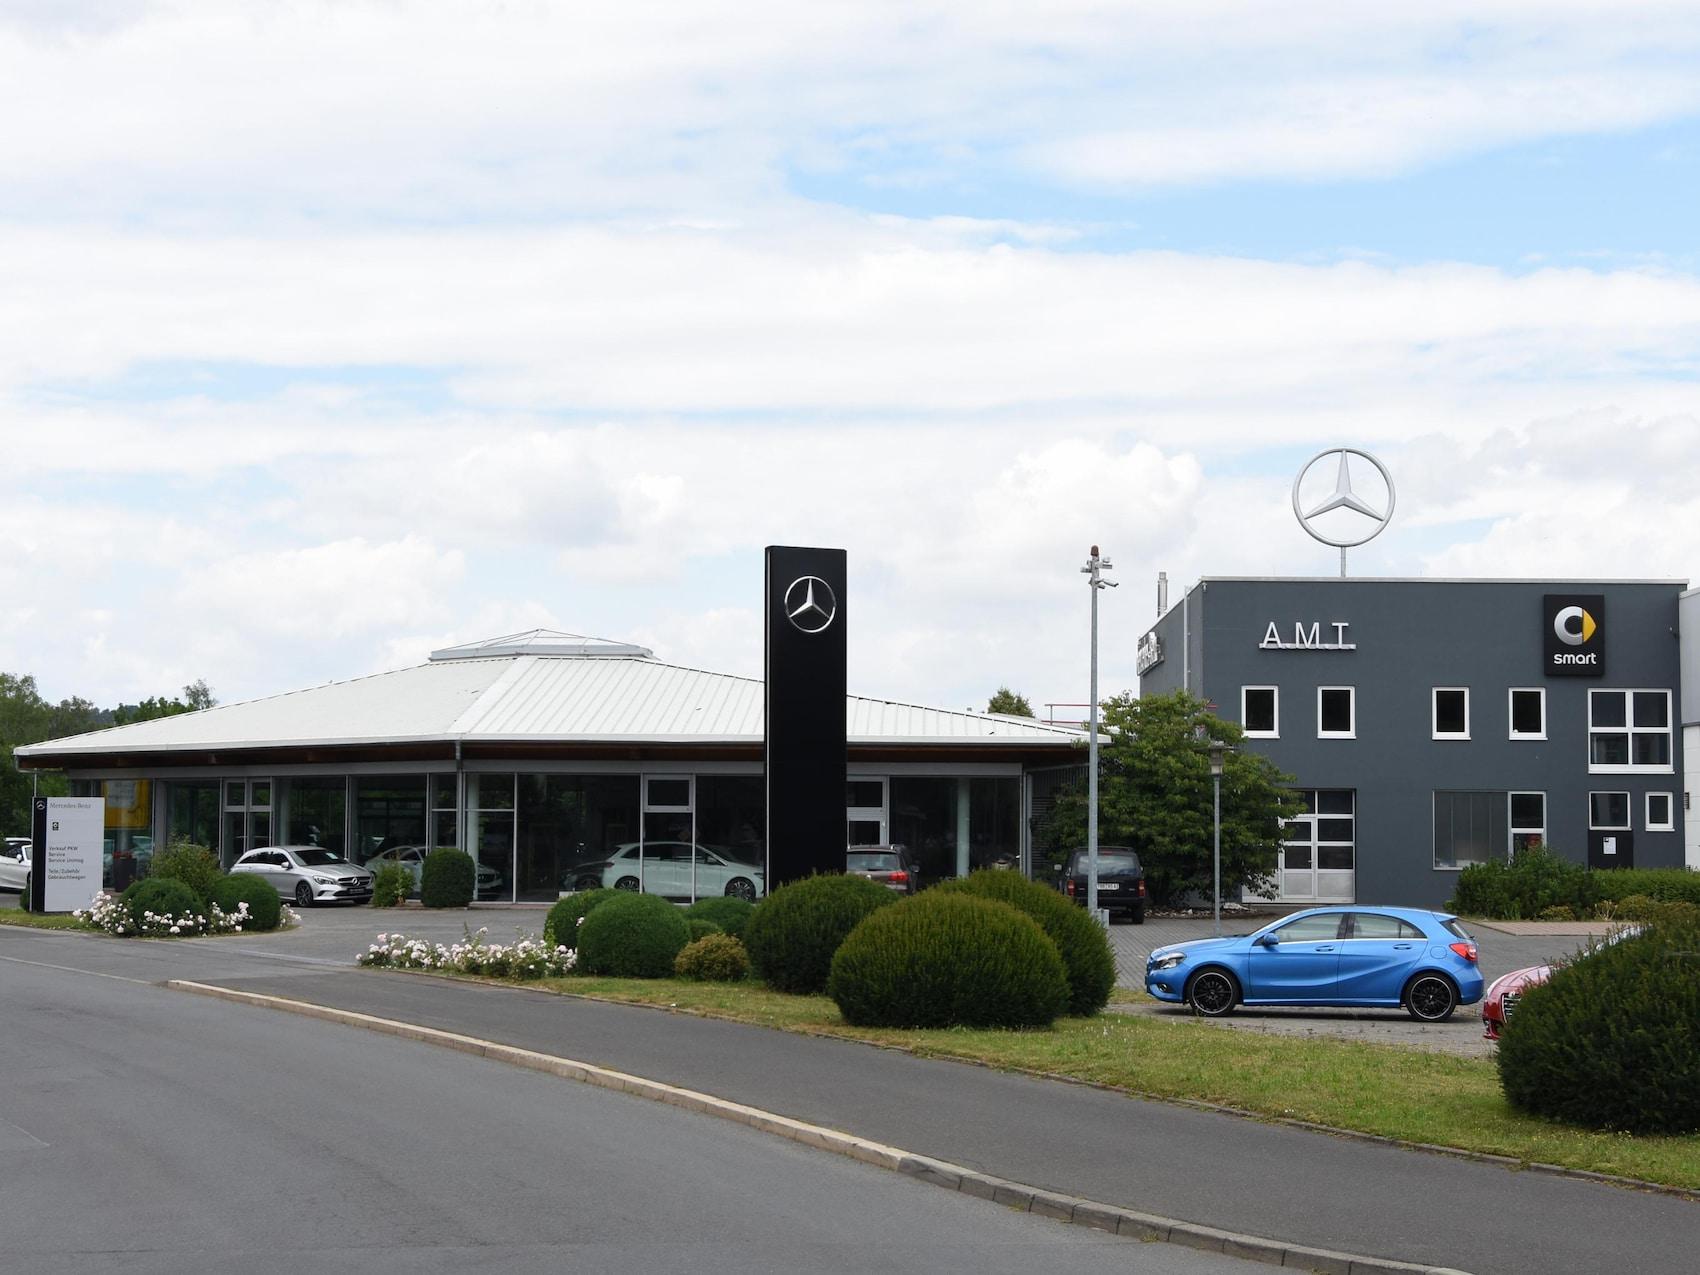 sSP-A.M.T.-Autohaus-Mittleres-Taubertal-Home-Buehne